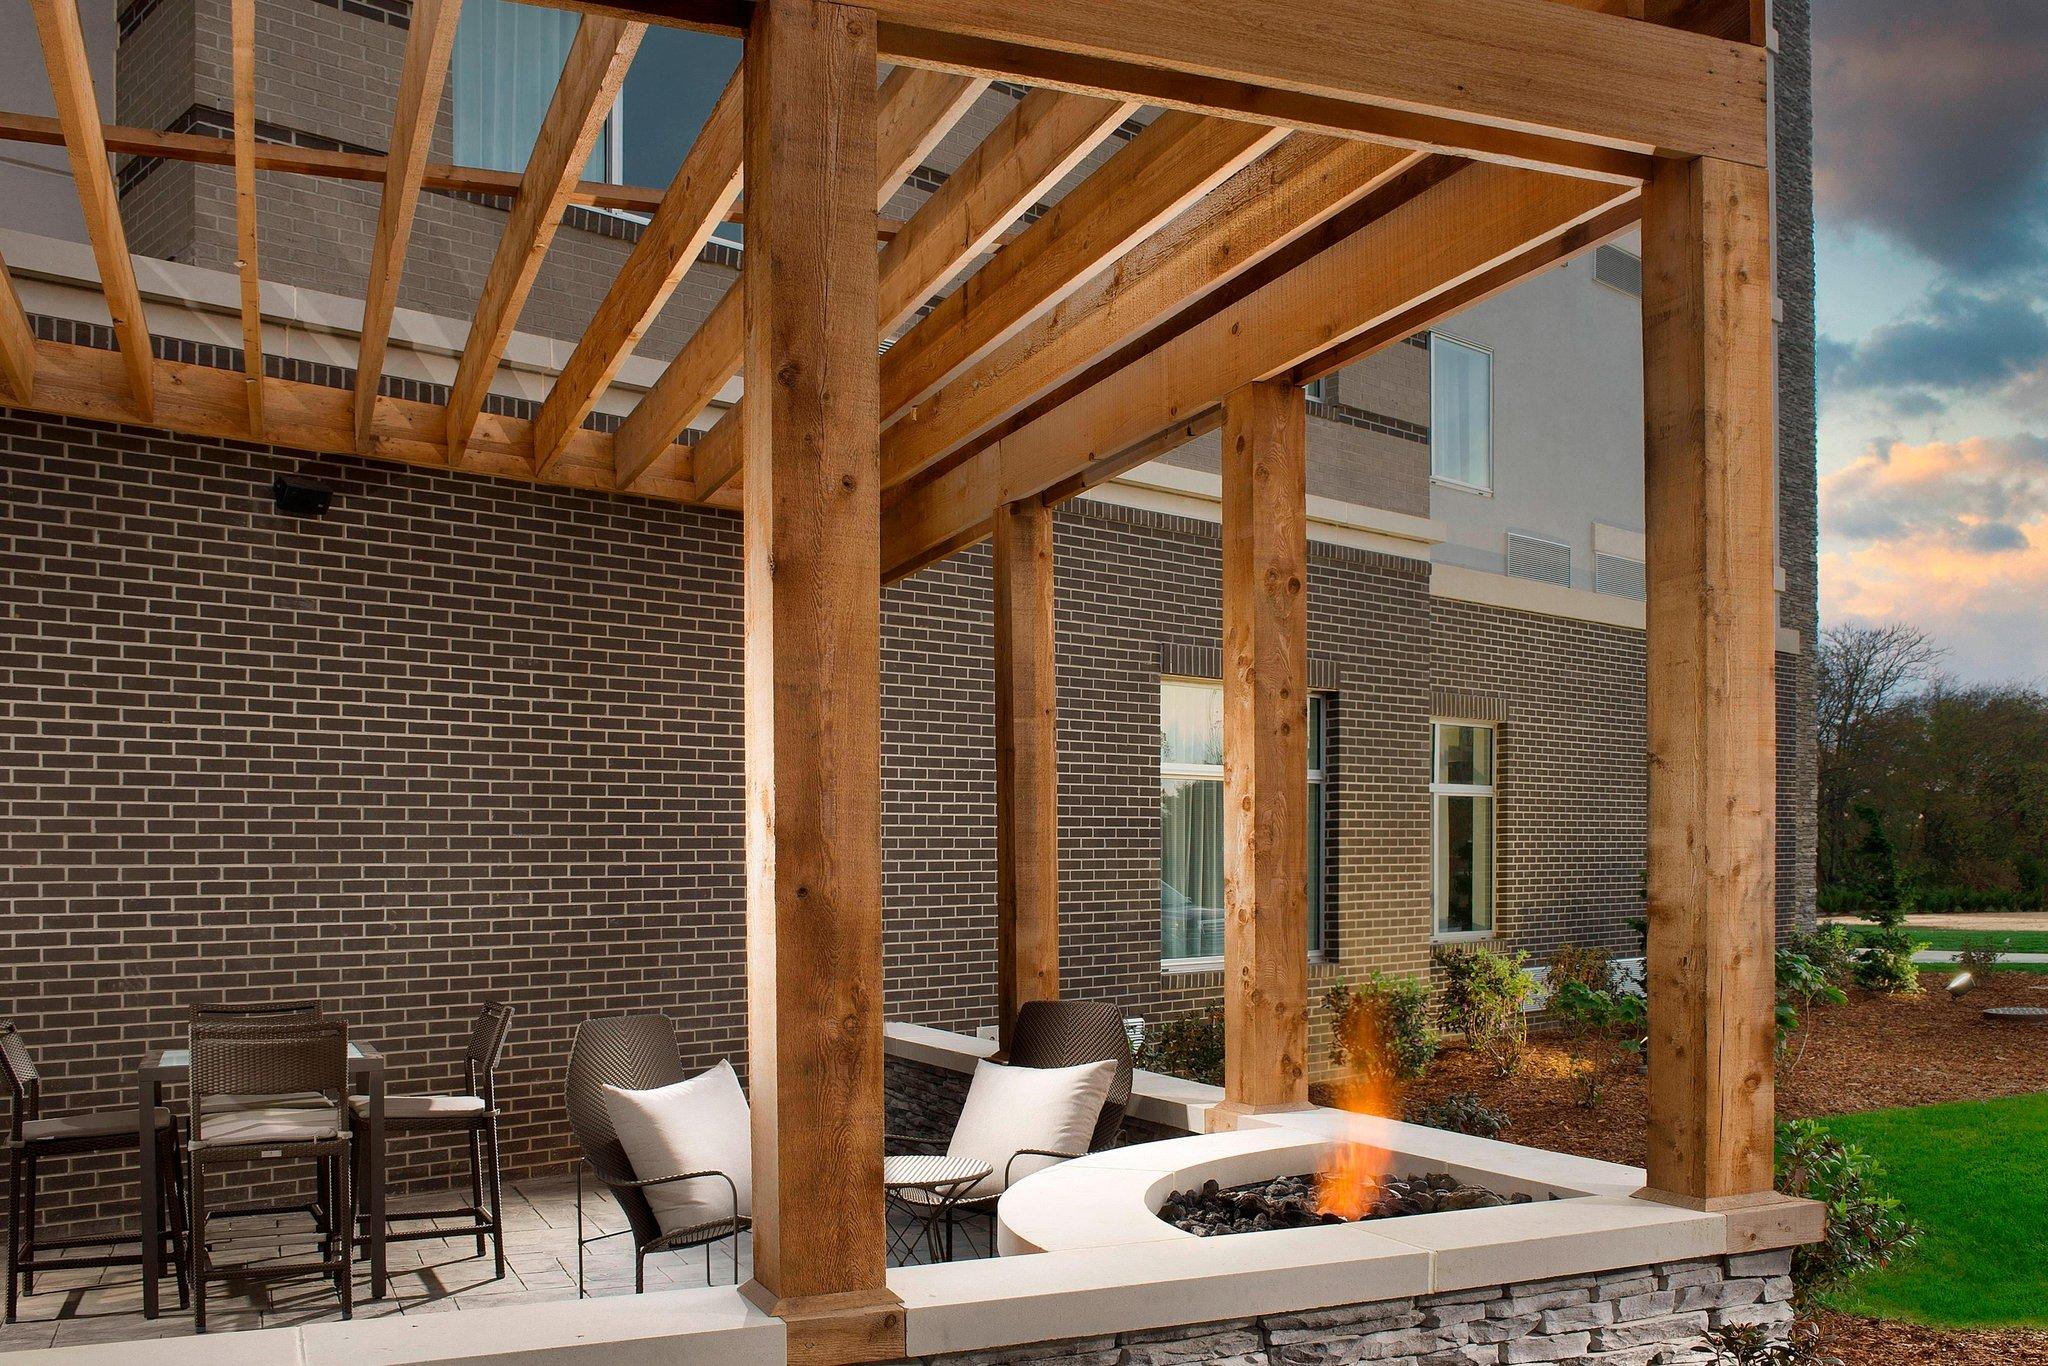 Courtyard by Marriott Nashville SE-Murfreesboro